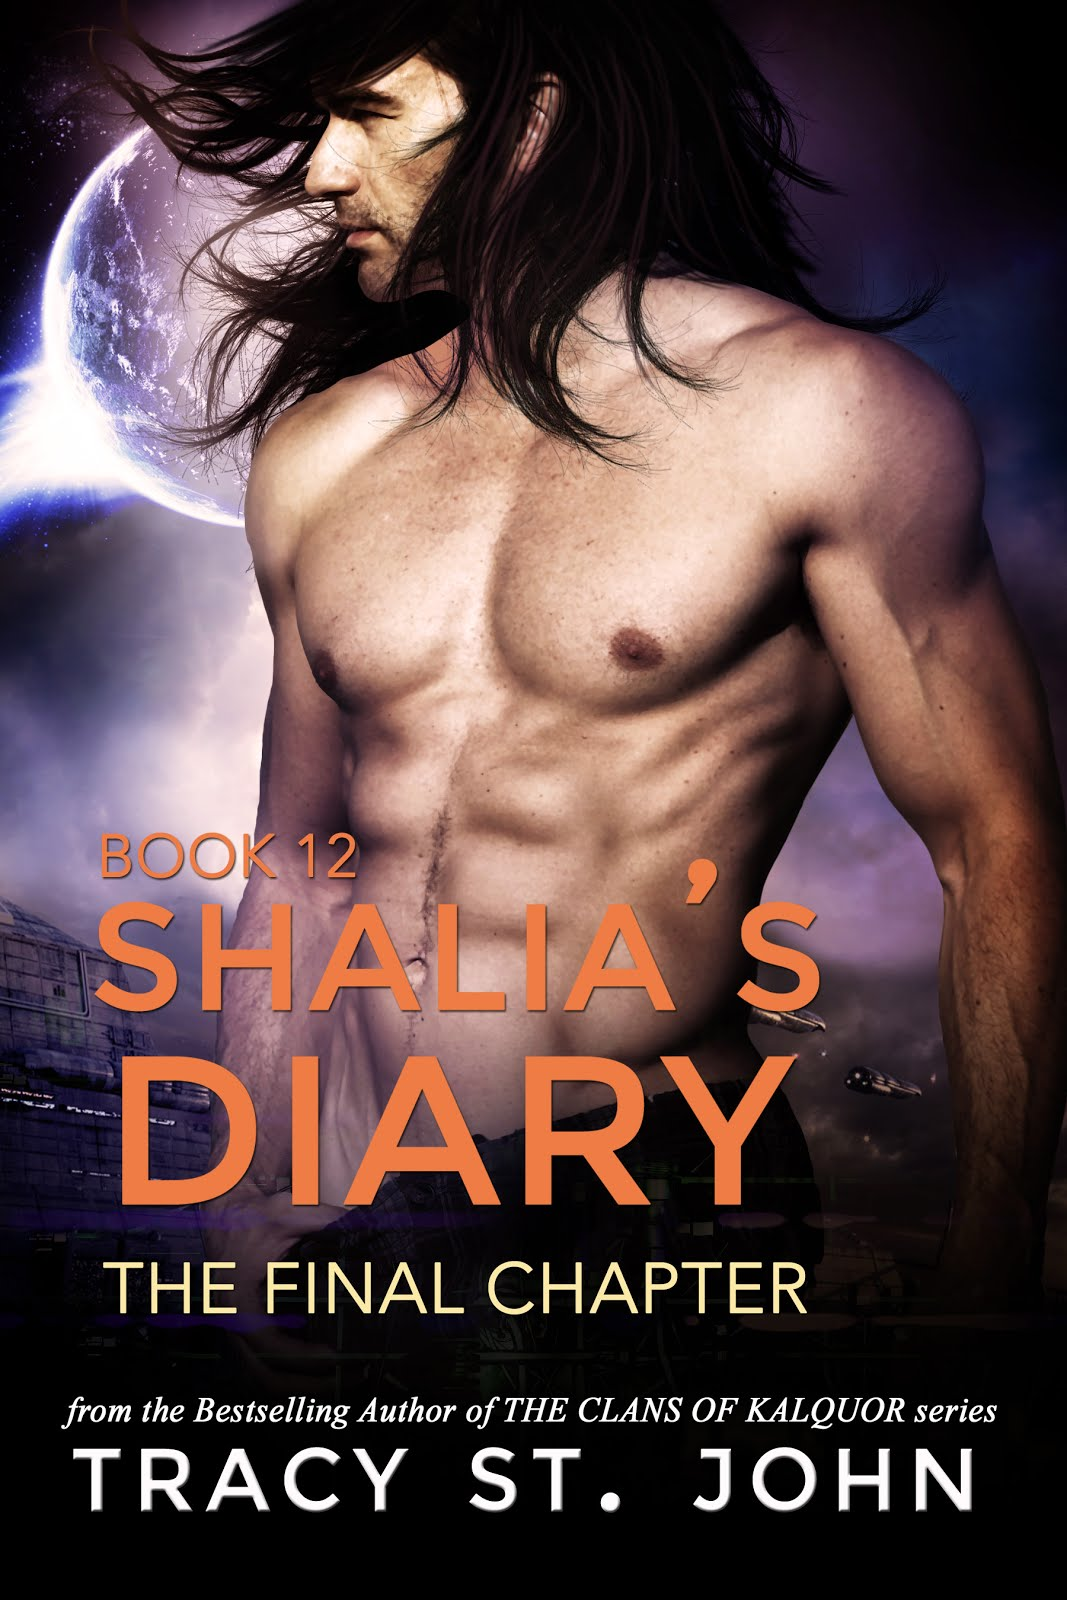 Shalia's Diary Book 12